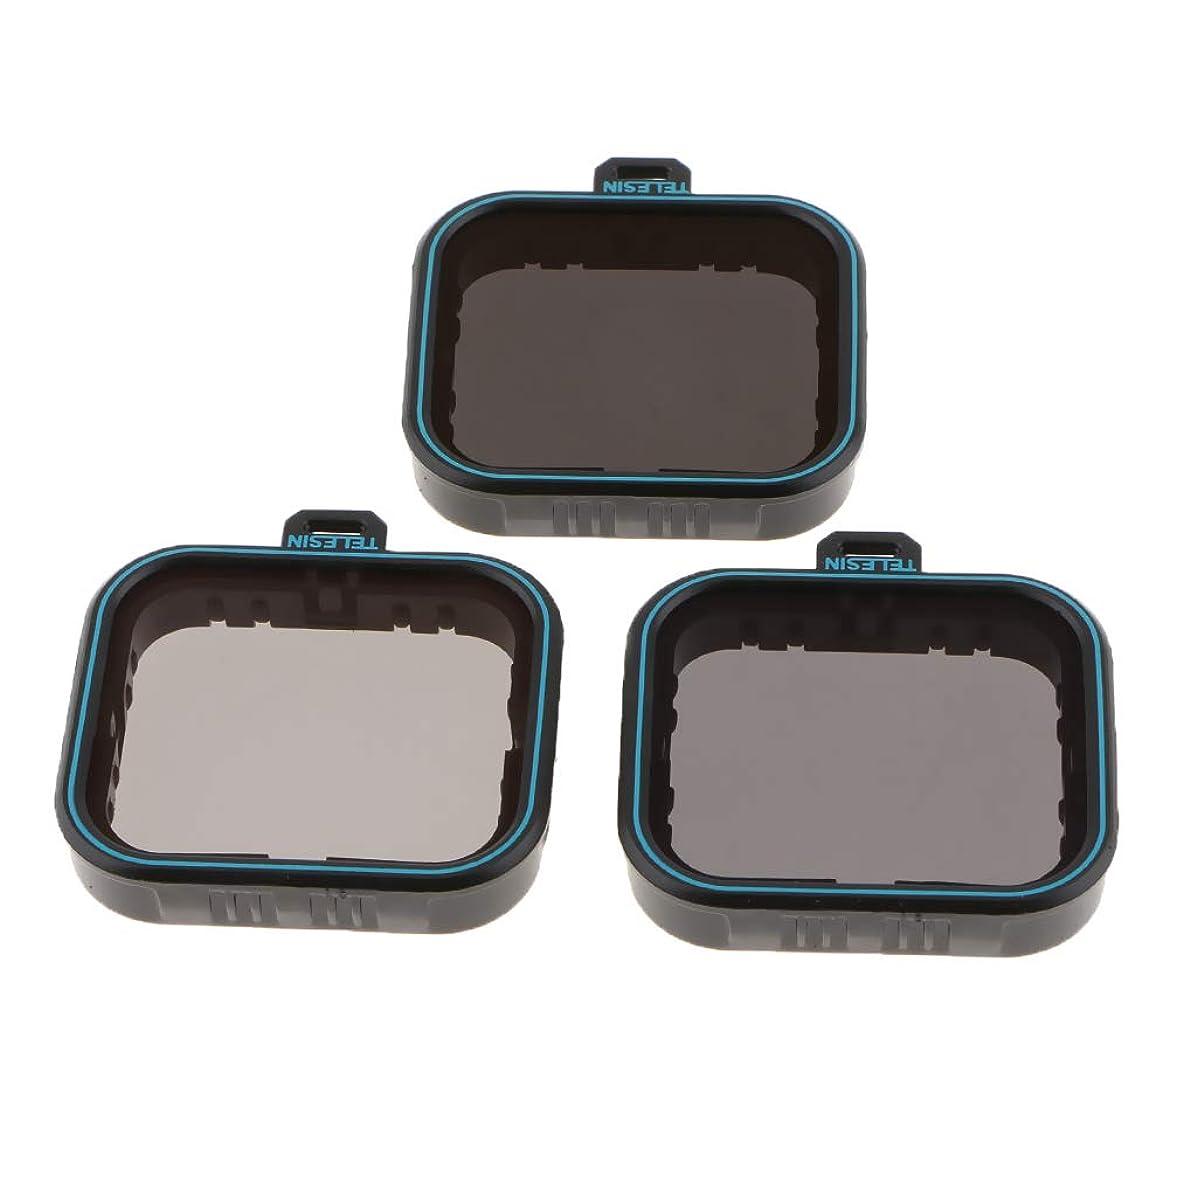 SM SunniMix for GoPro Hero 5 6 7 Black Camera Lens ND Filter Set Kit ND4 ND8 ND16 Reduce Interference Light Prevent Overexposure